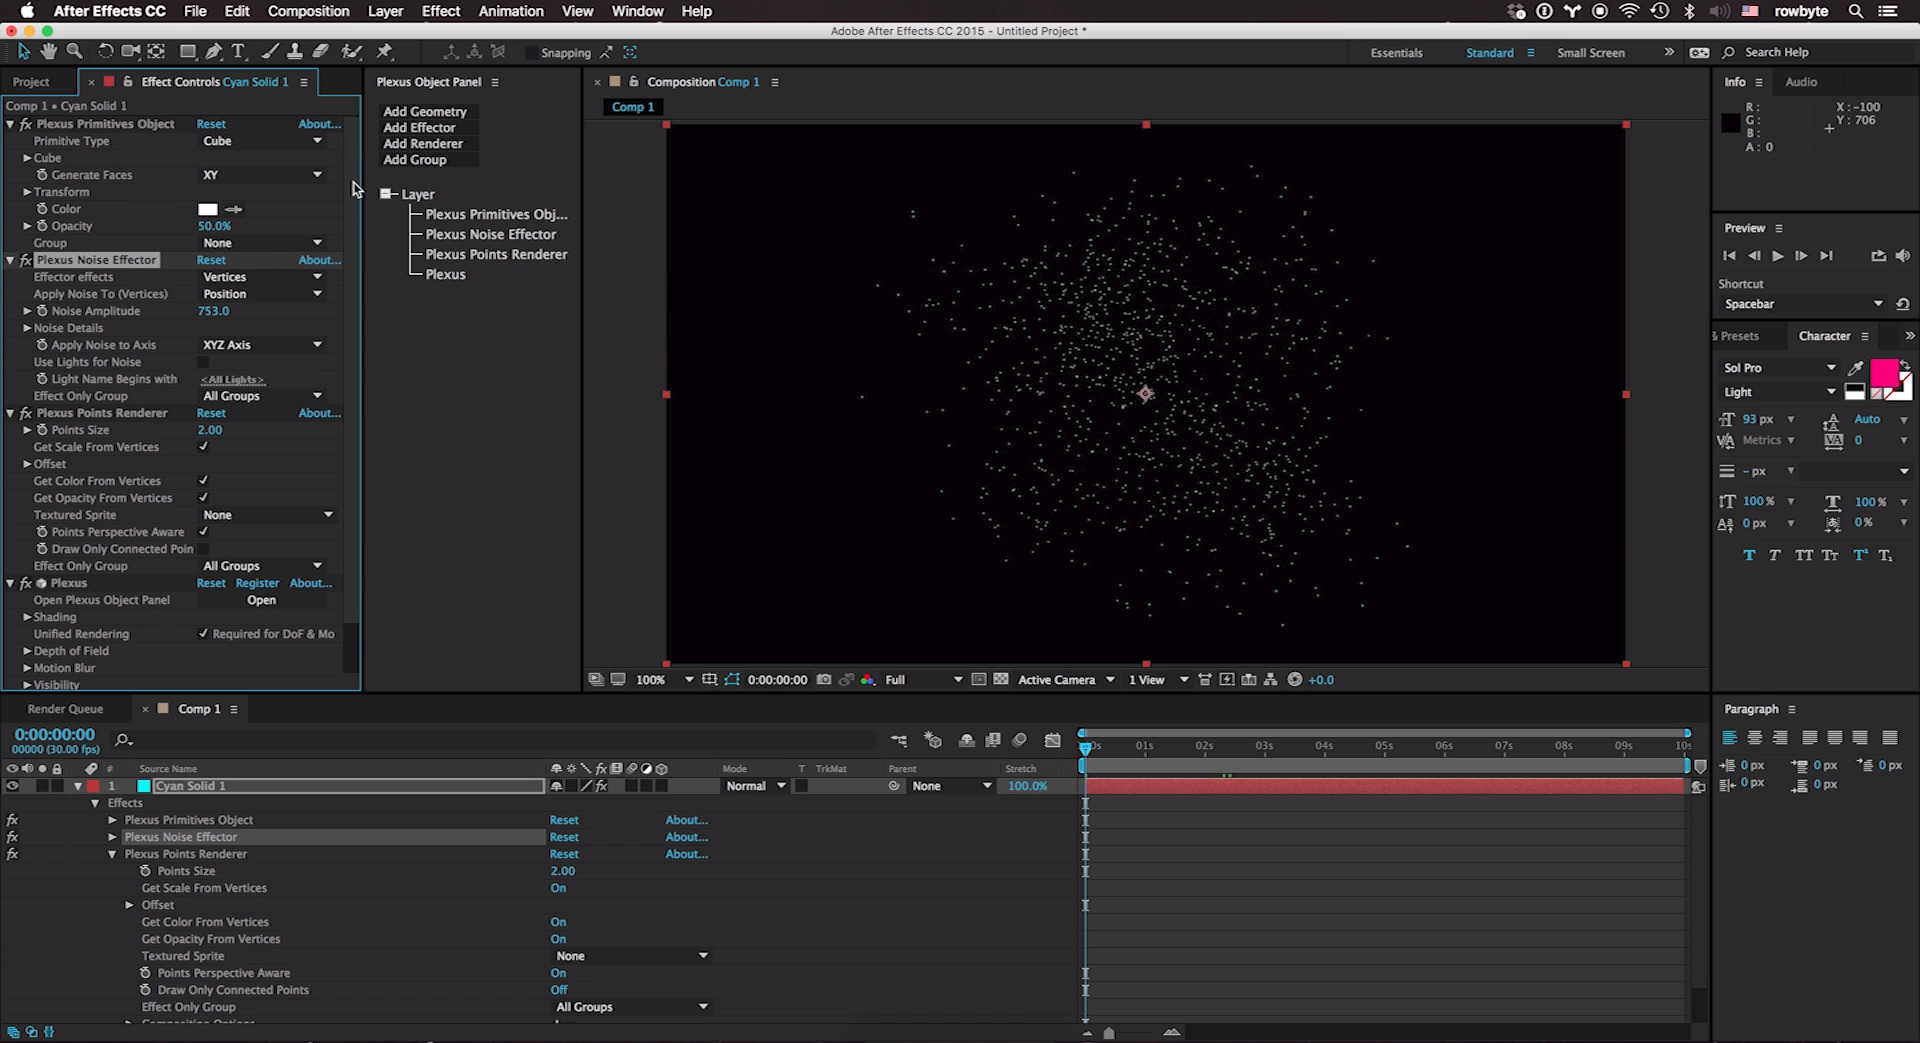 Rowbyte Plexus for Adobe After Effects v3.x (Floating Server License) - additional image 1